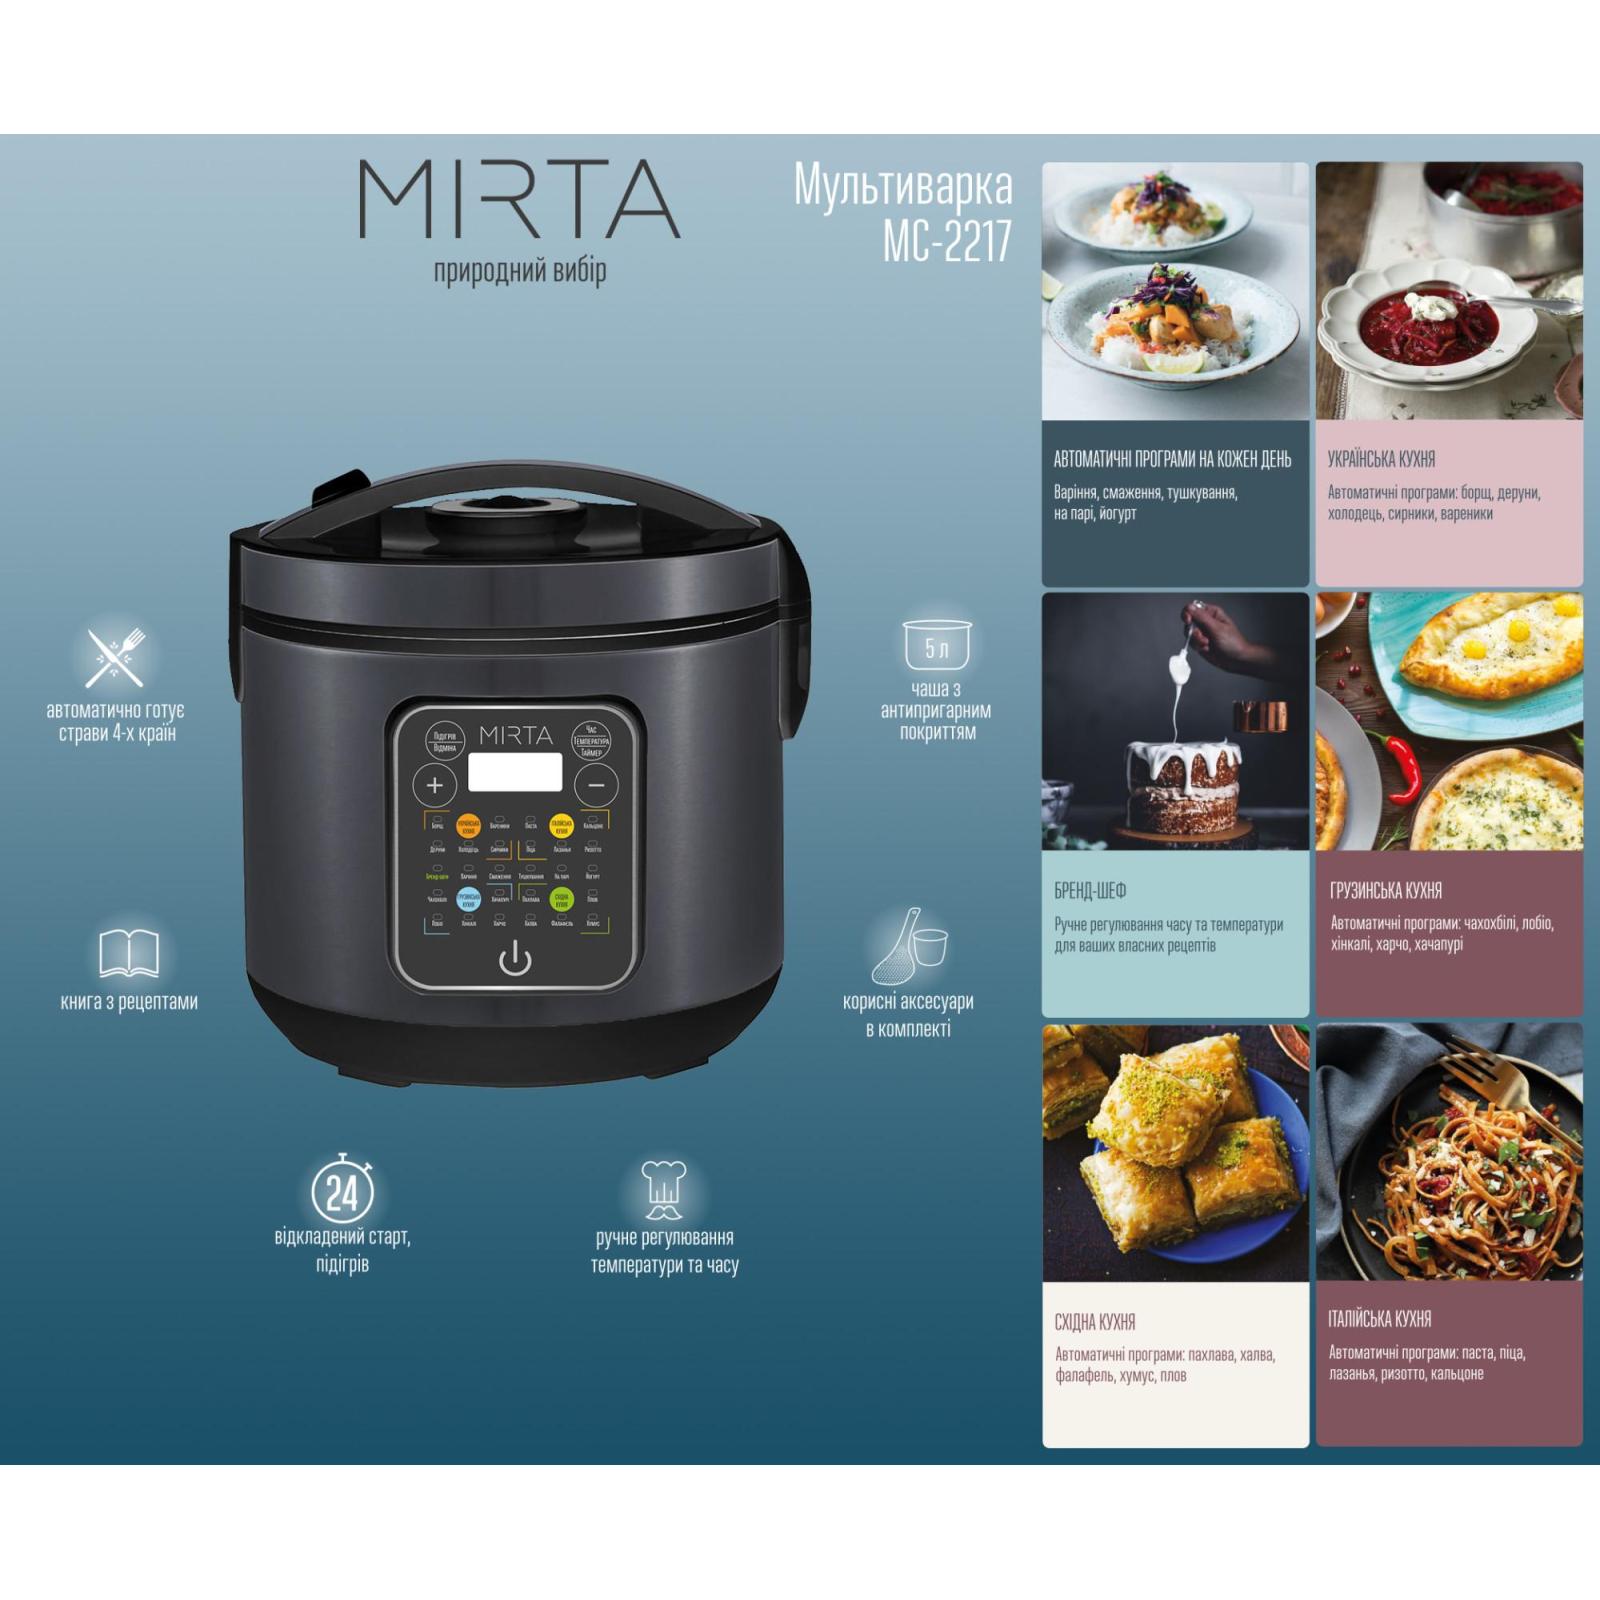 Мультиварка Mirta MC-2217 изображение 2